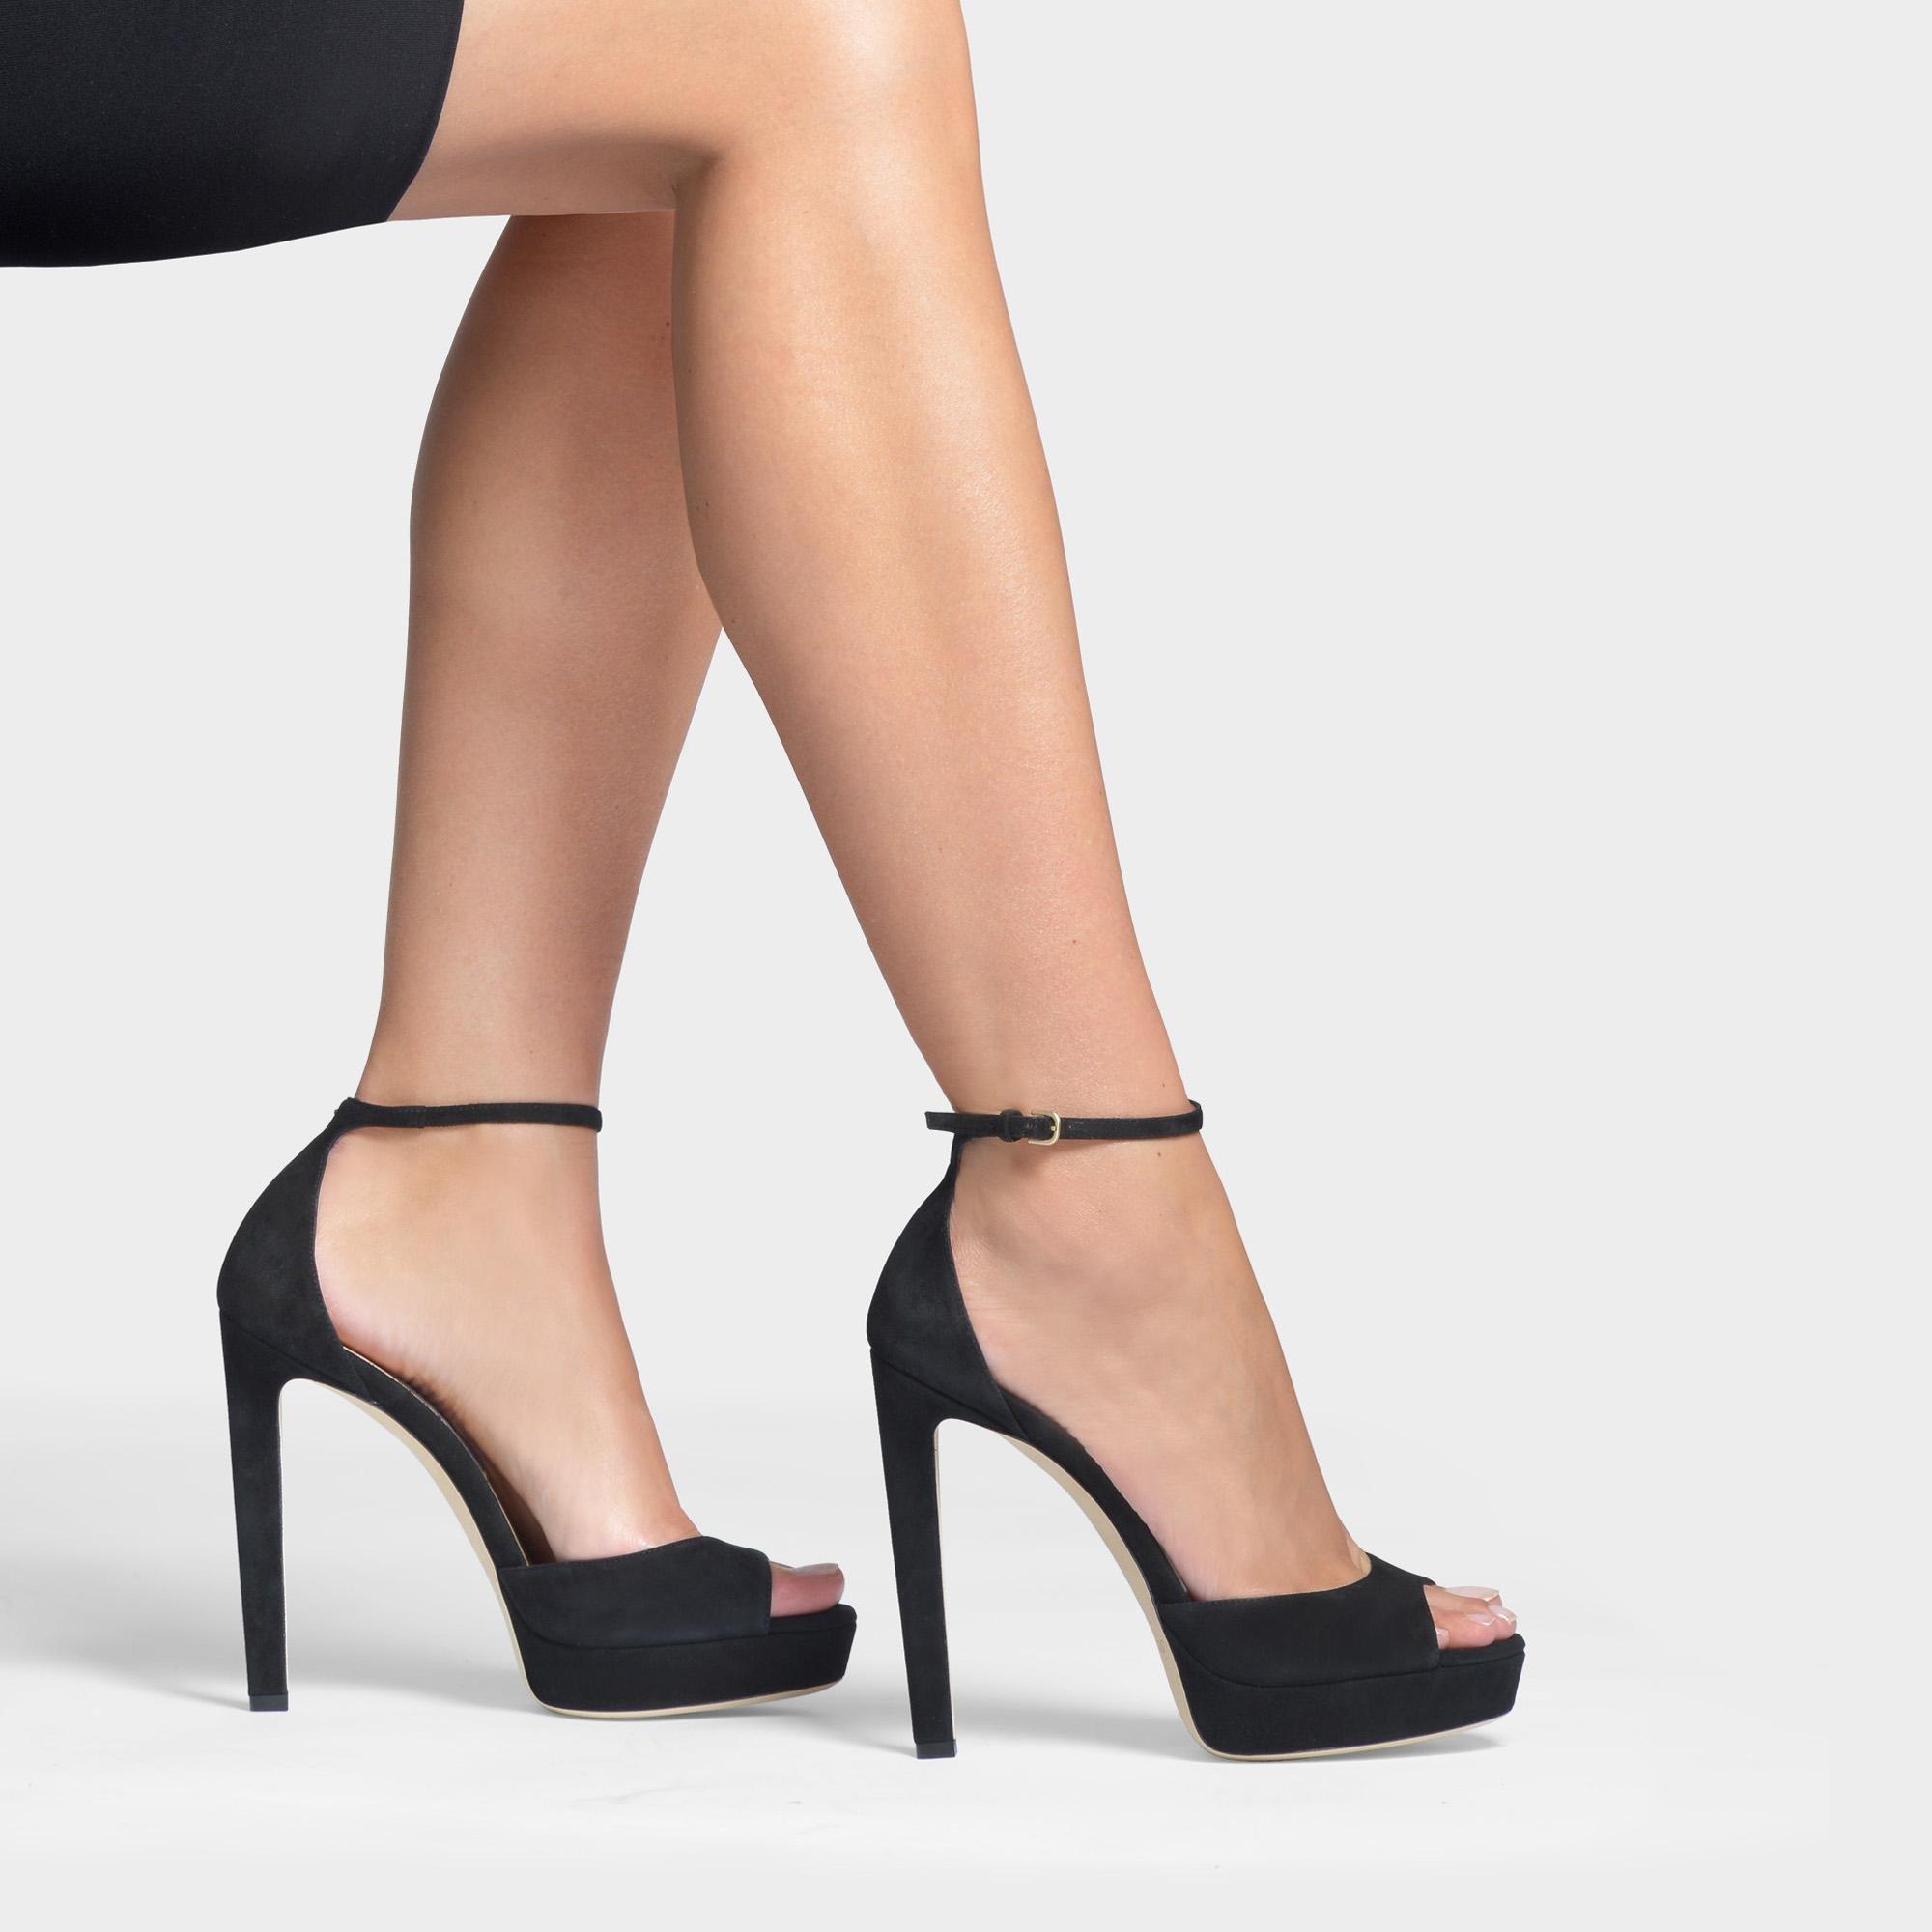 714b0753673 Jimmy Choo - Pattie 130 Platform Sandals In Black Suede - Lyst. View  fullscreen